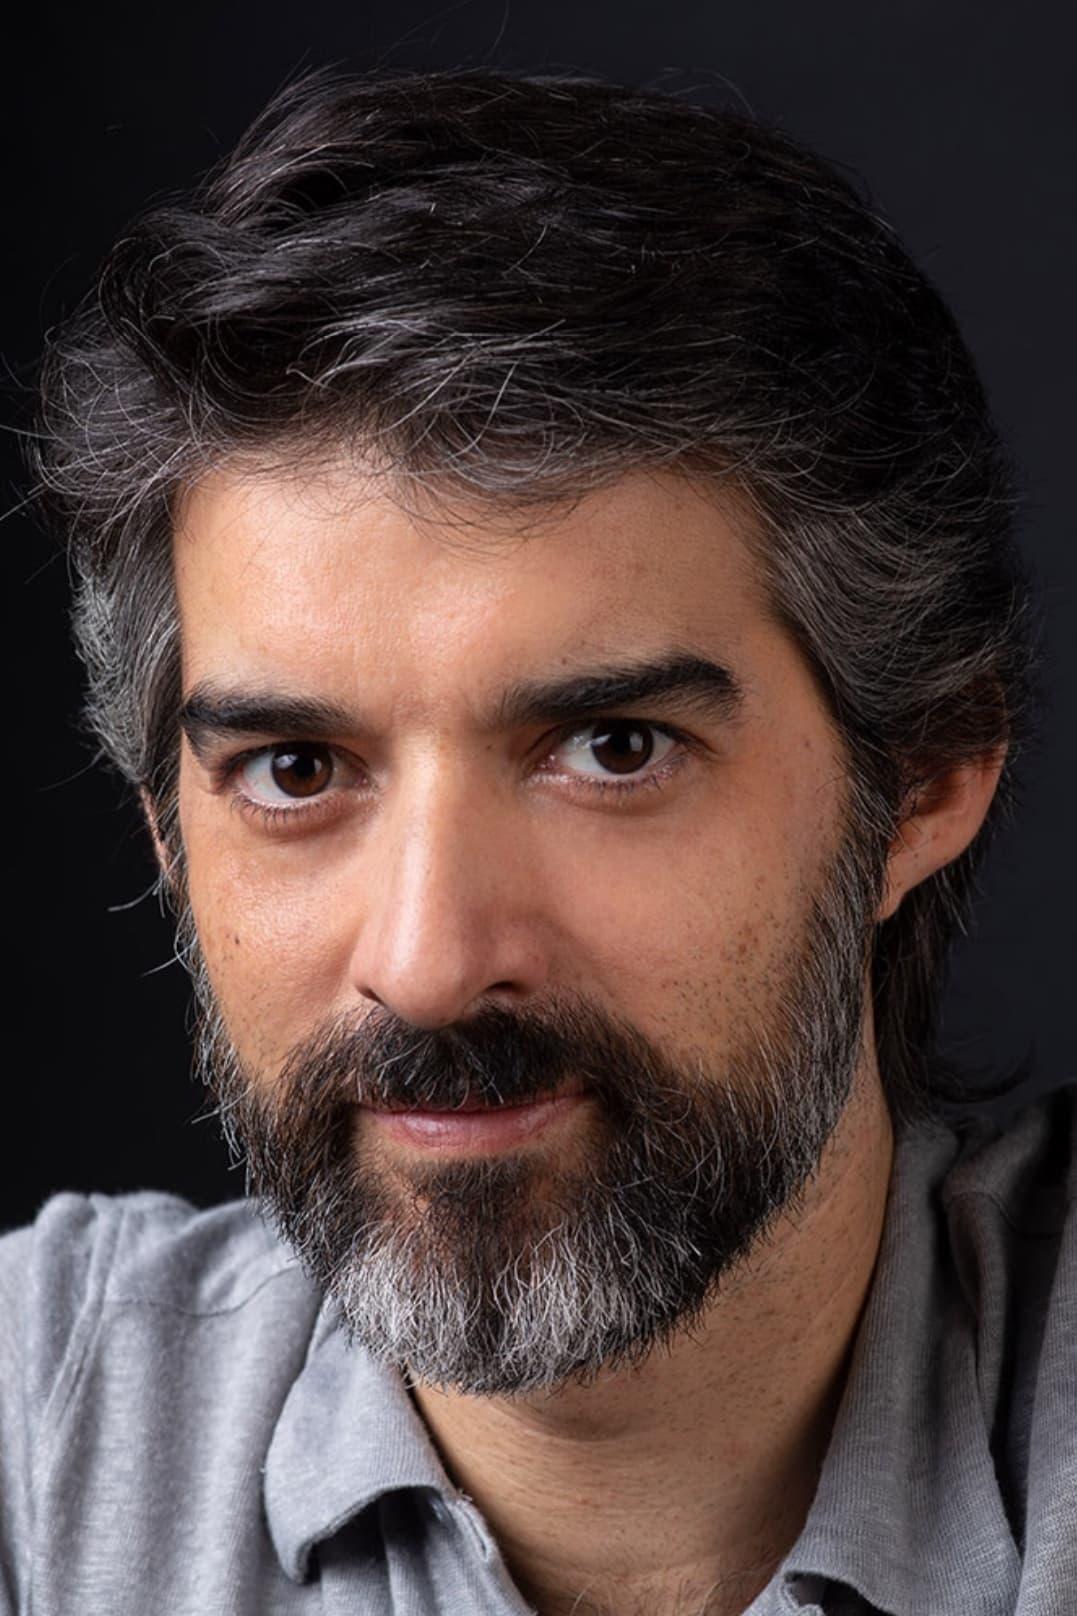 Pedro Frias